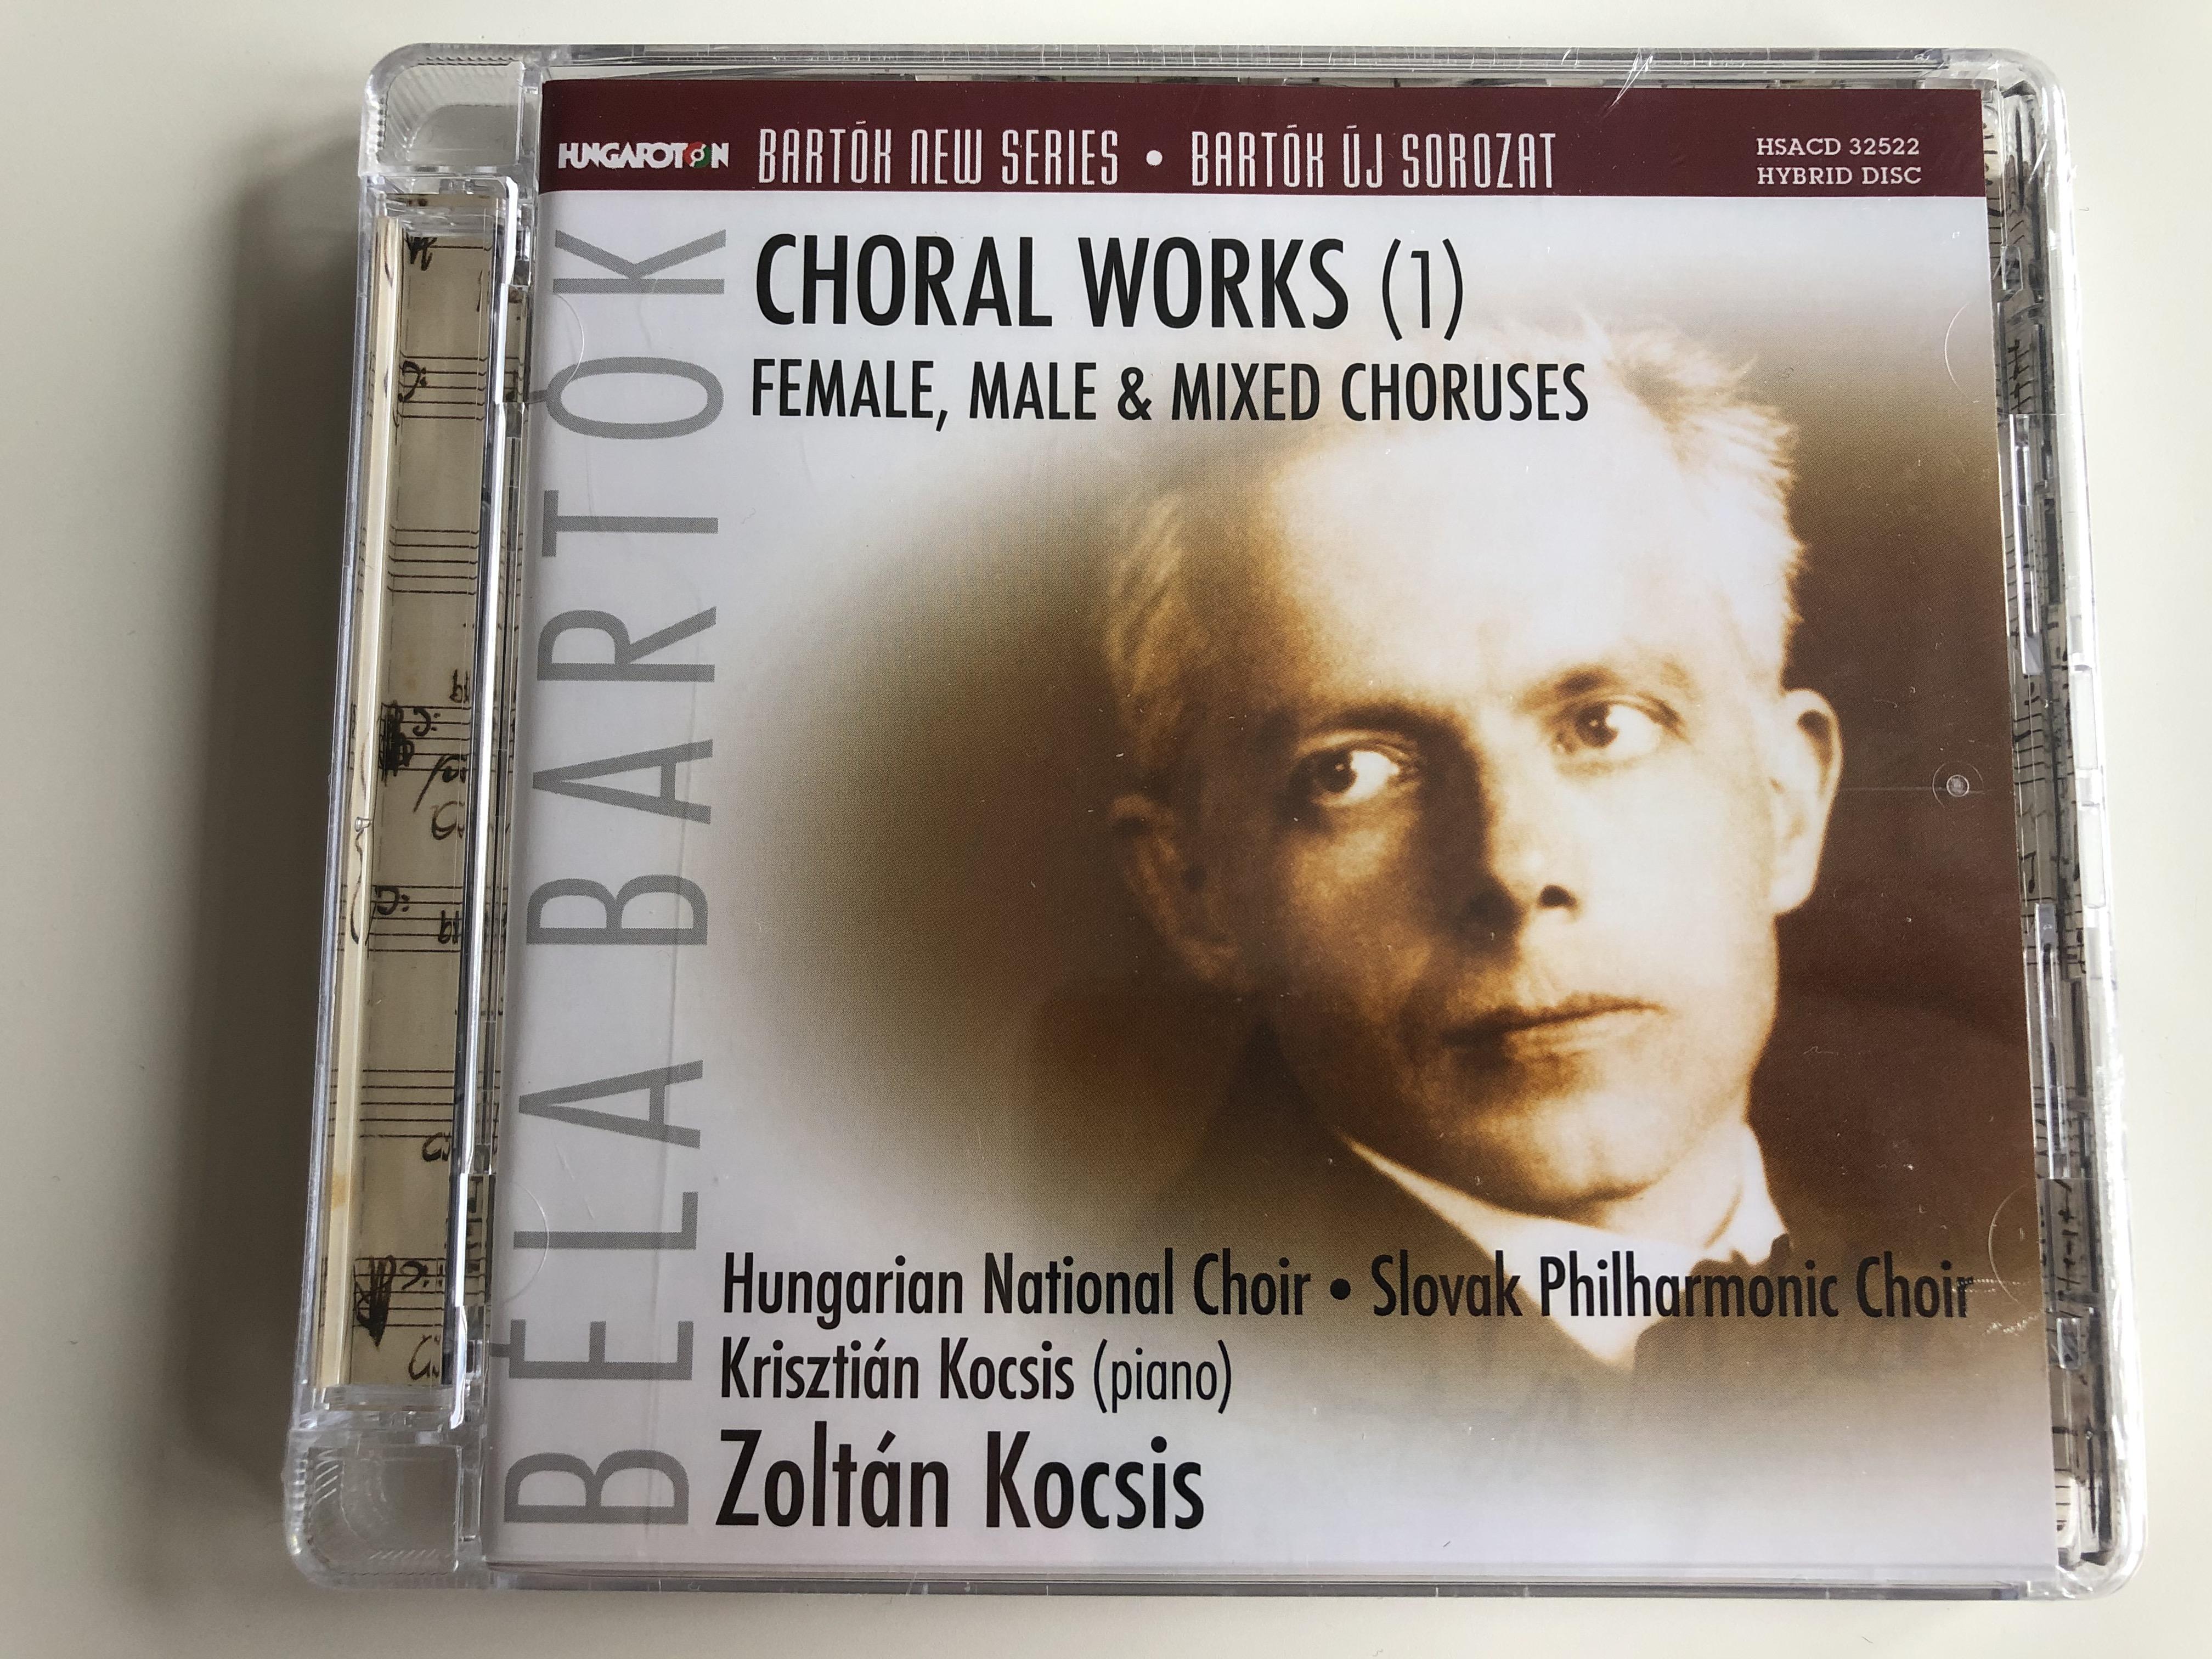 bela-bartok-choral-works-1-female-male-mixed-choruses-hungarian-national-choir-slovak-philharmonic-choir-kriszitan-kocsis-piano-zoltan-kocsis-bartok-new-series-hungaroton-audio-cd.jpg